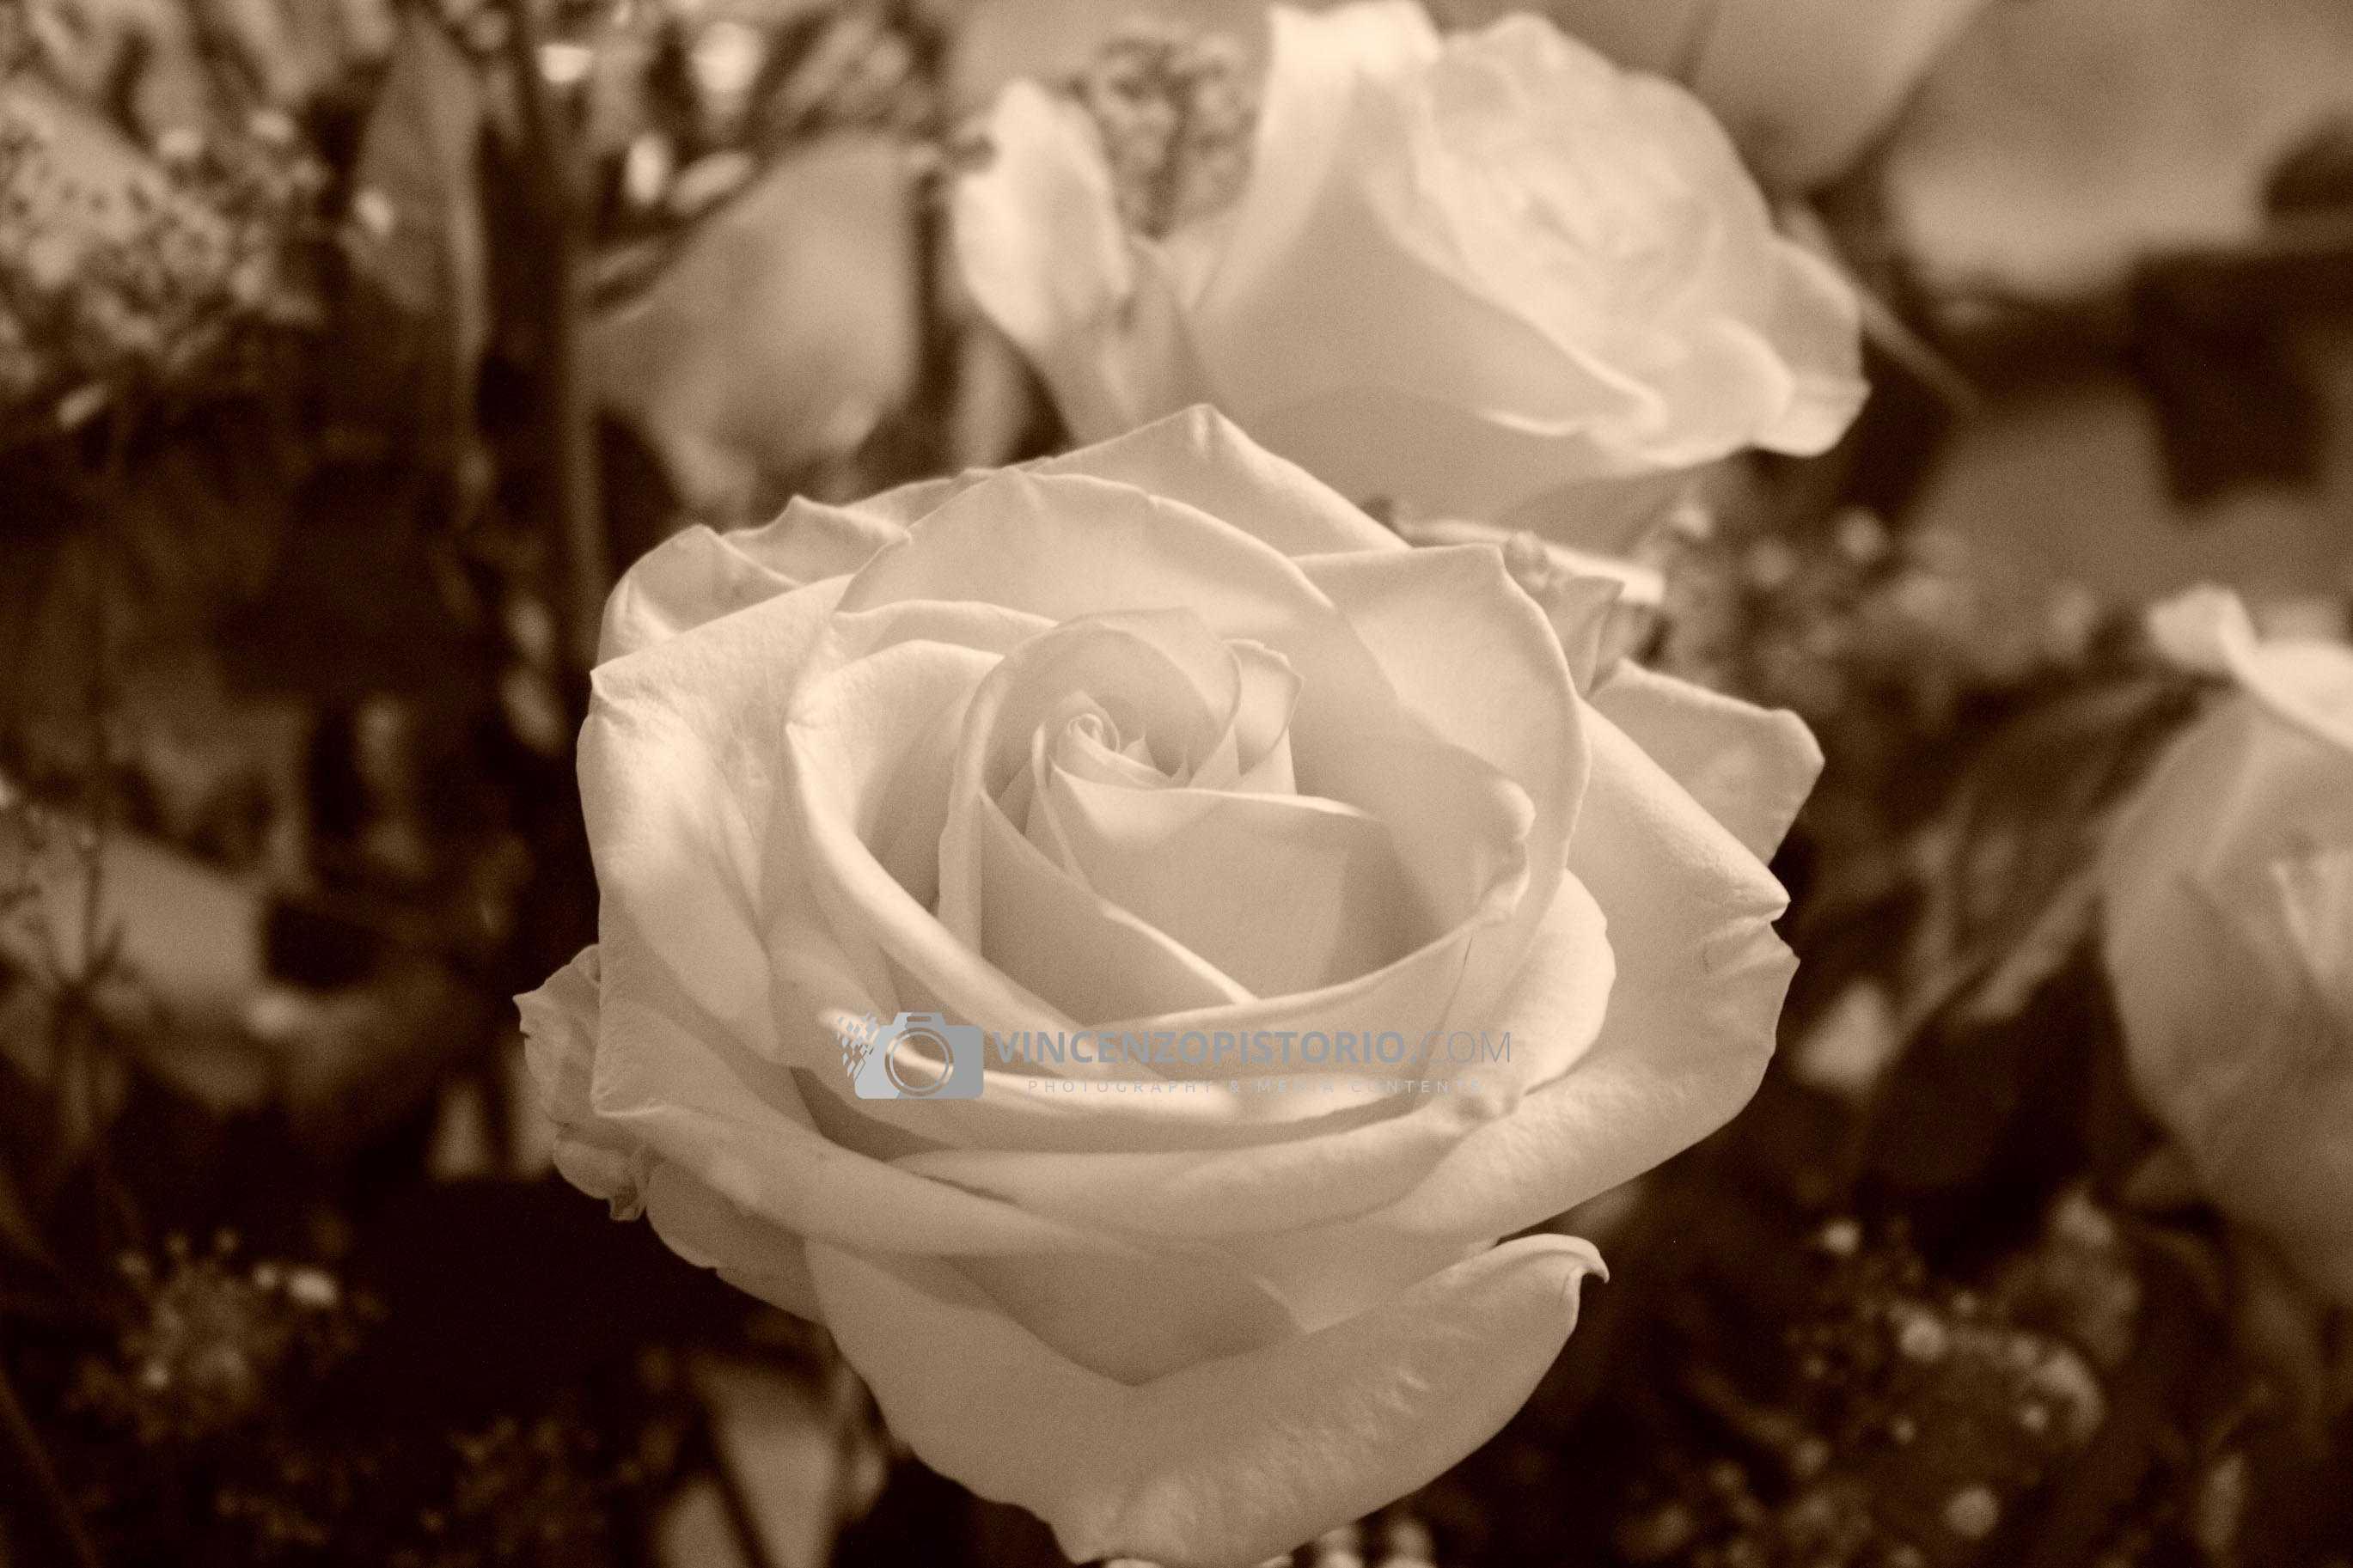 S. Lorenzo – a white rose